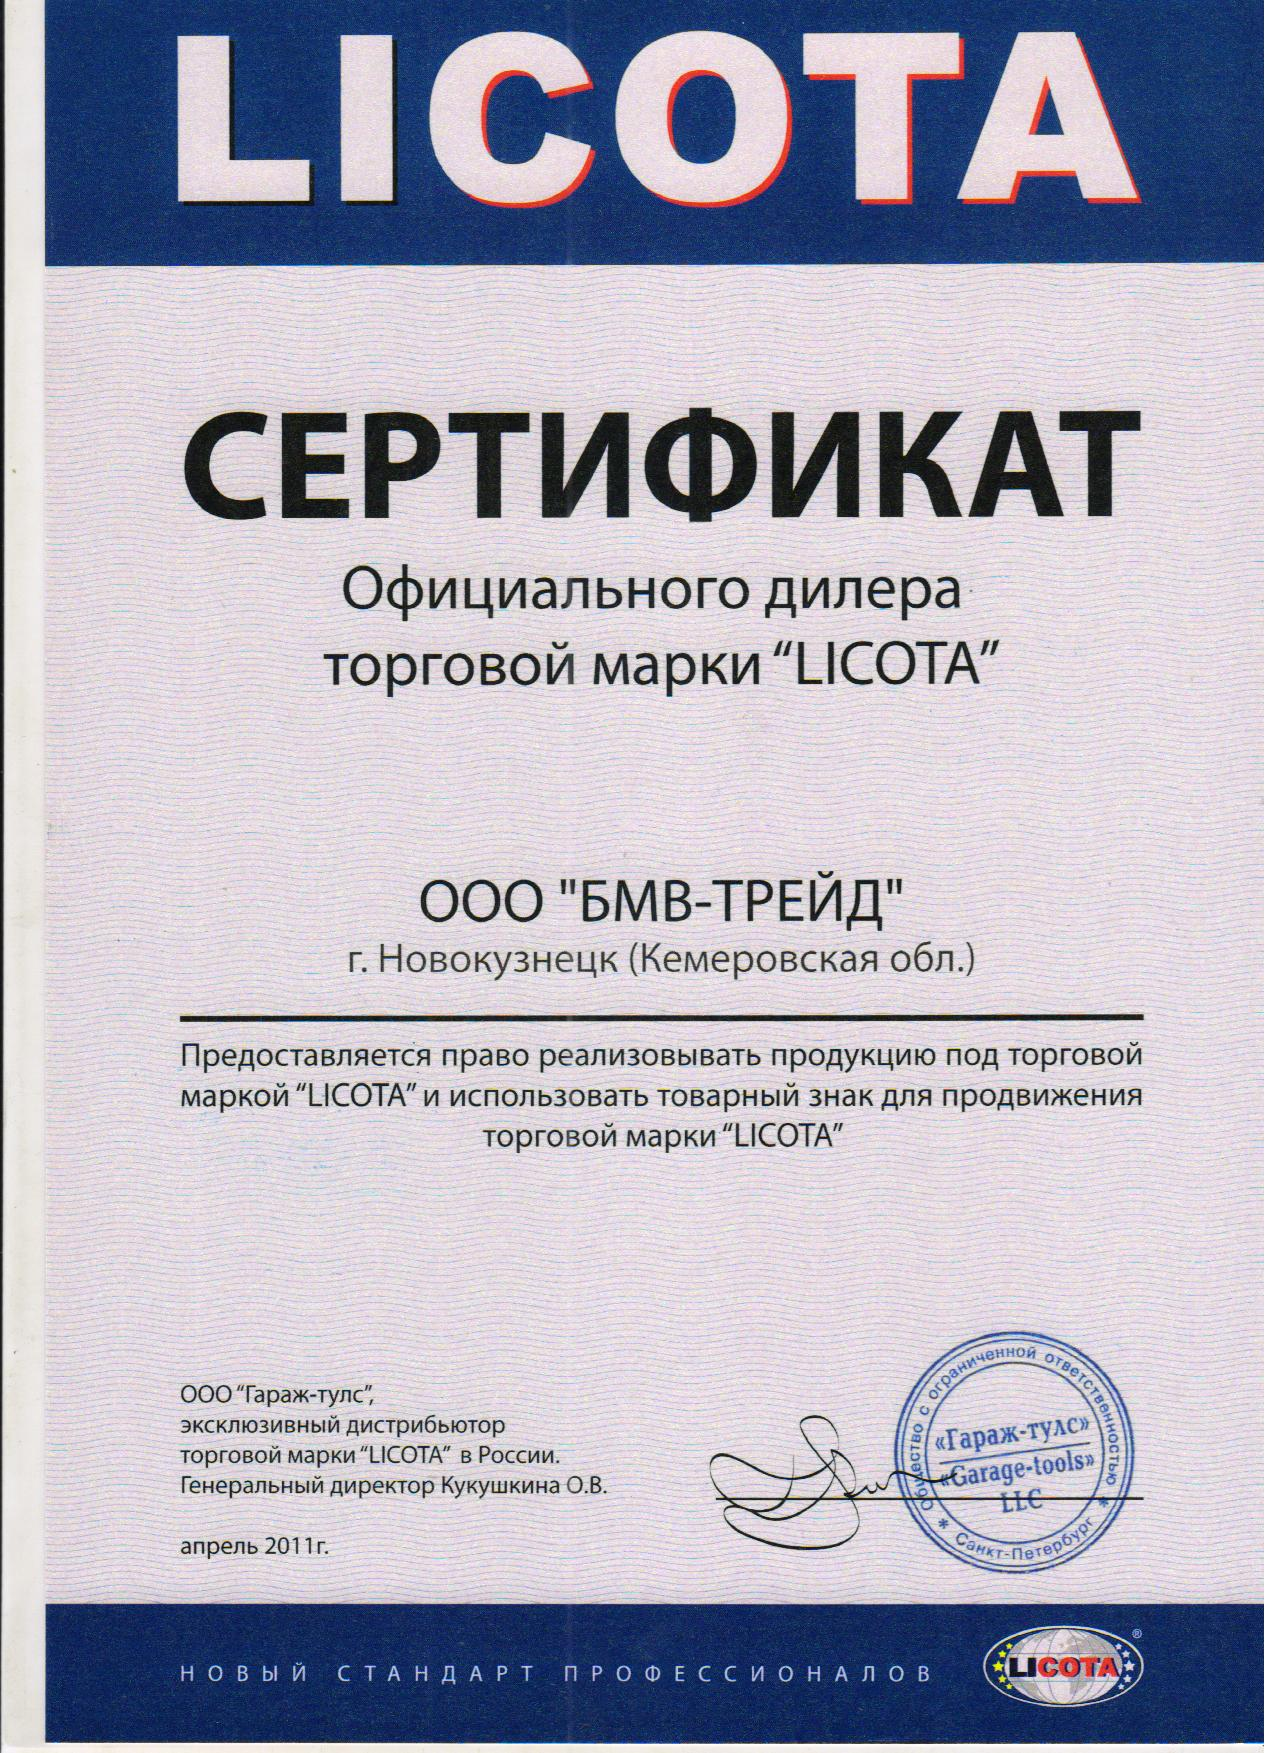 Сертификат дилера Licata. БМВ-Трейд